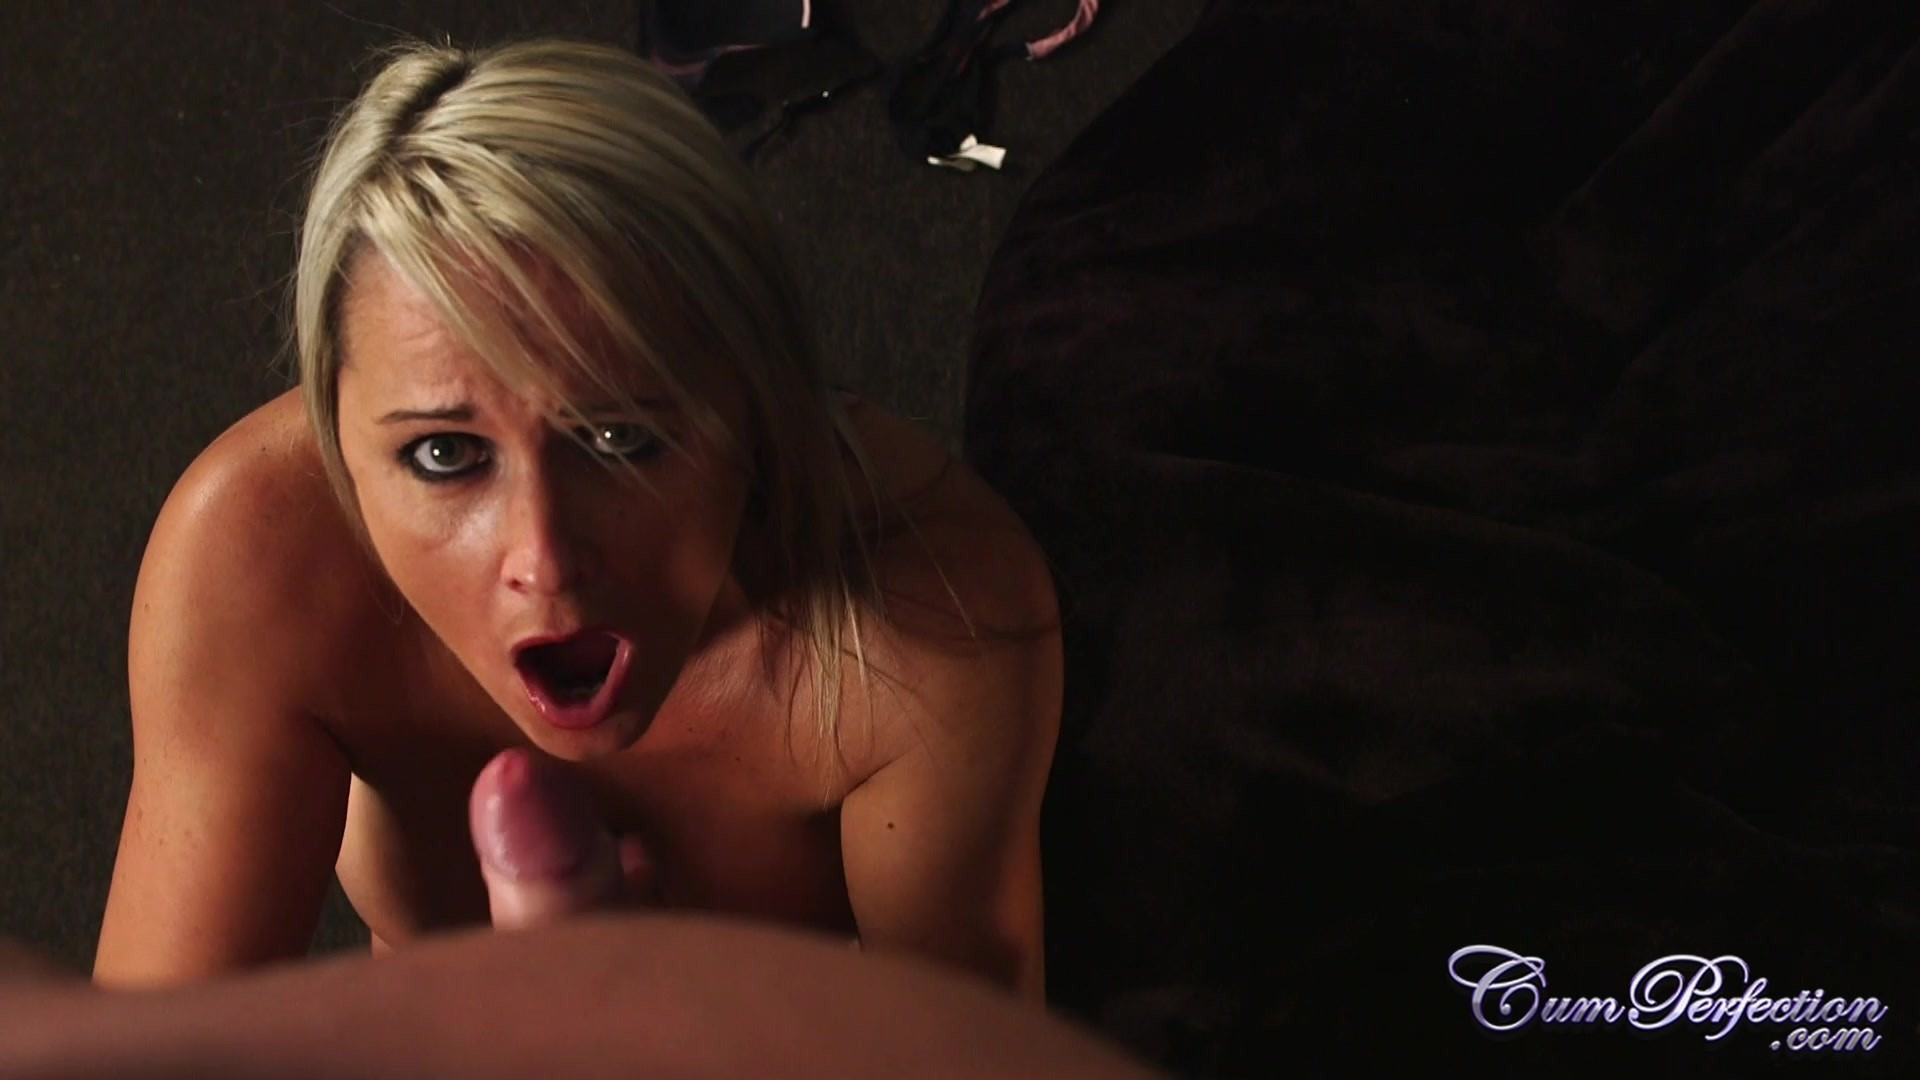 Angel Scott - Сперма на лицо - Галерея № 3570288